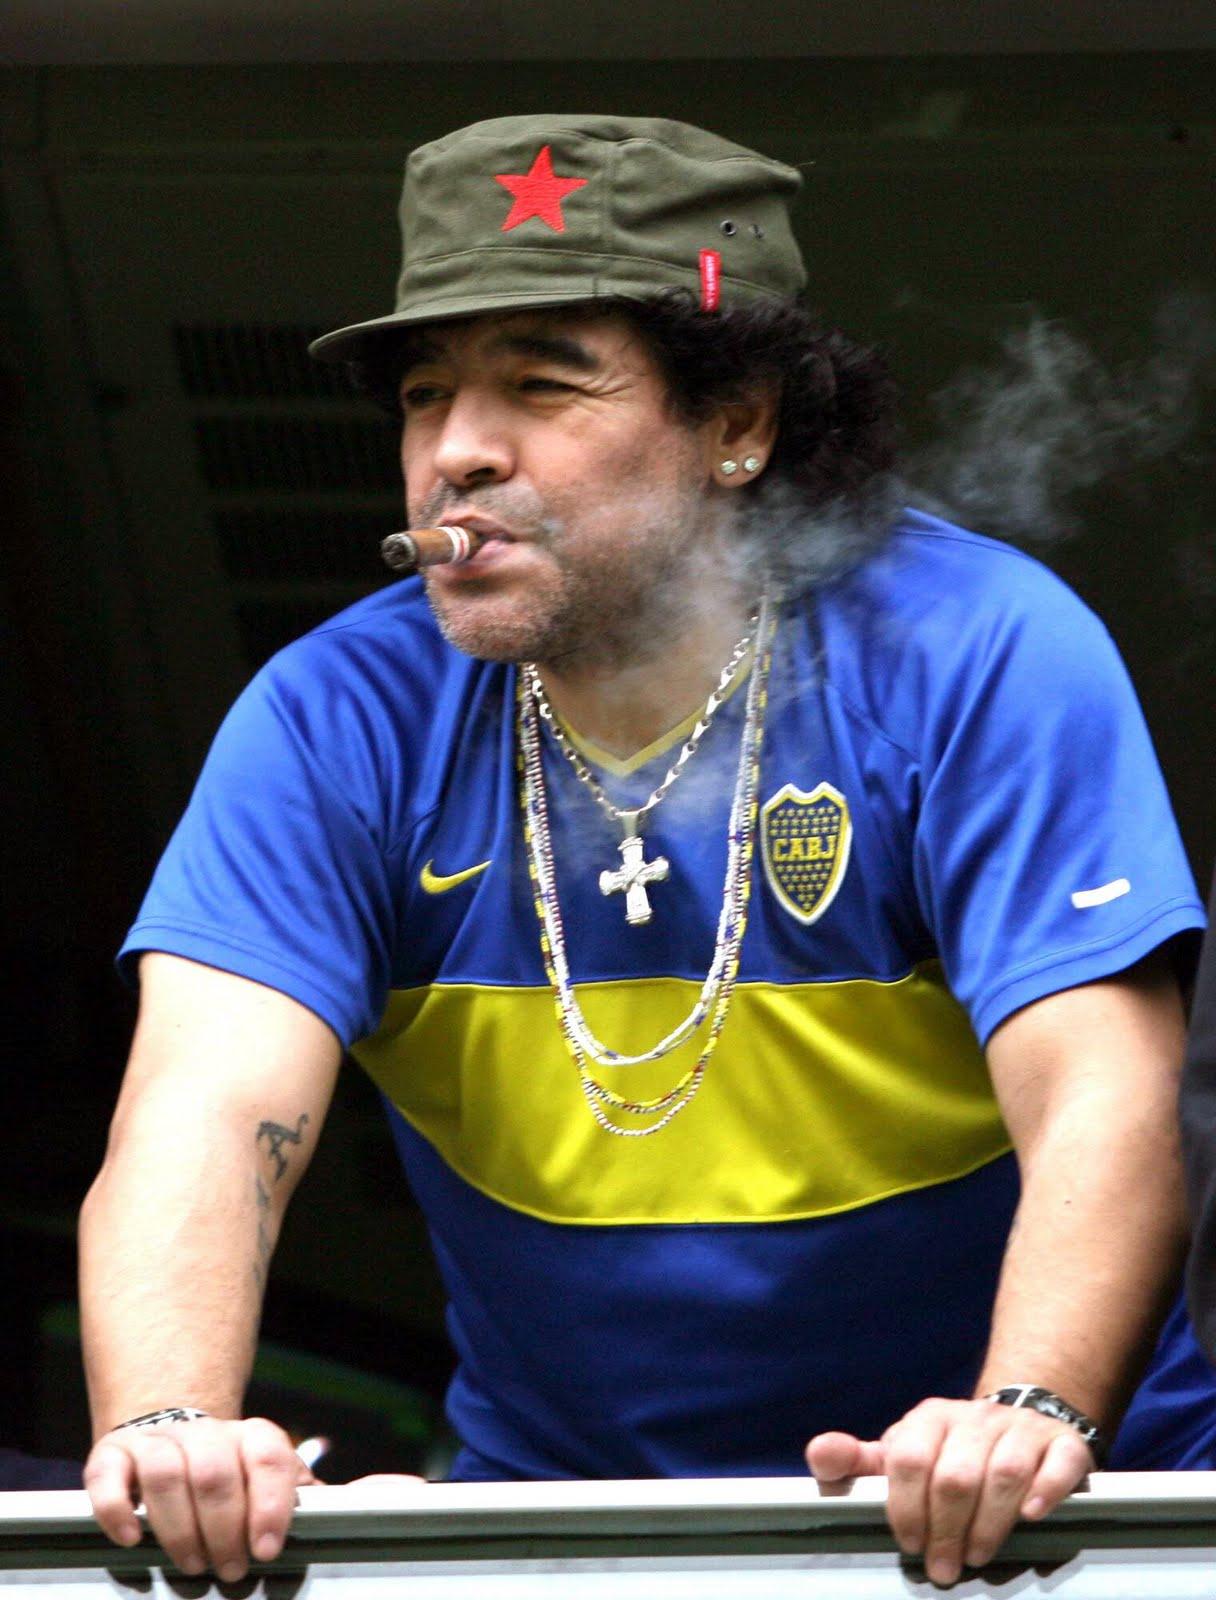 World Famous Football Player Diego Maradona WIki Photosa